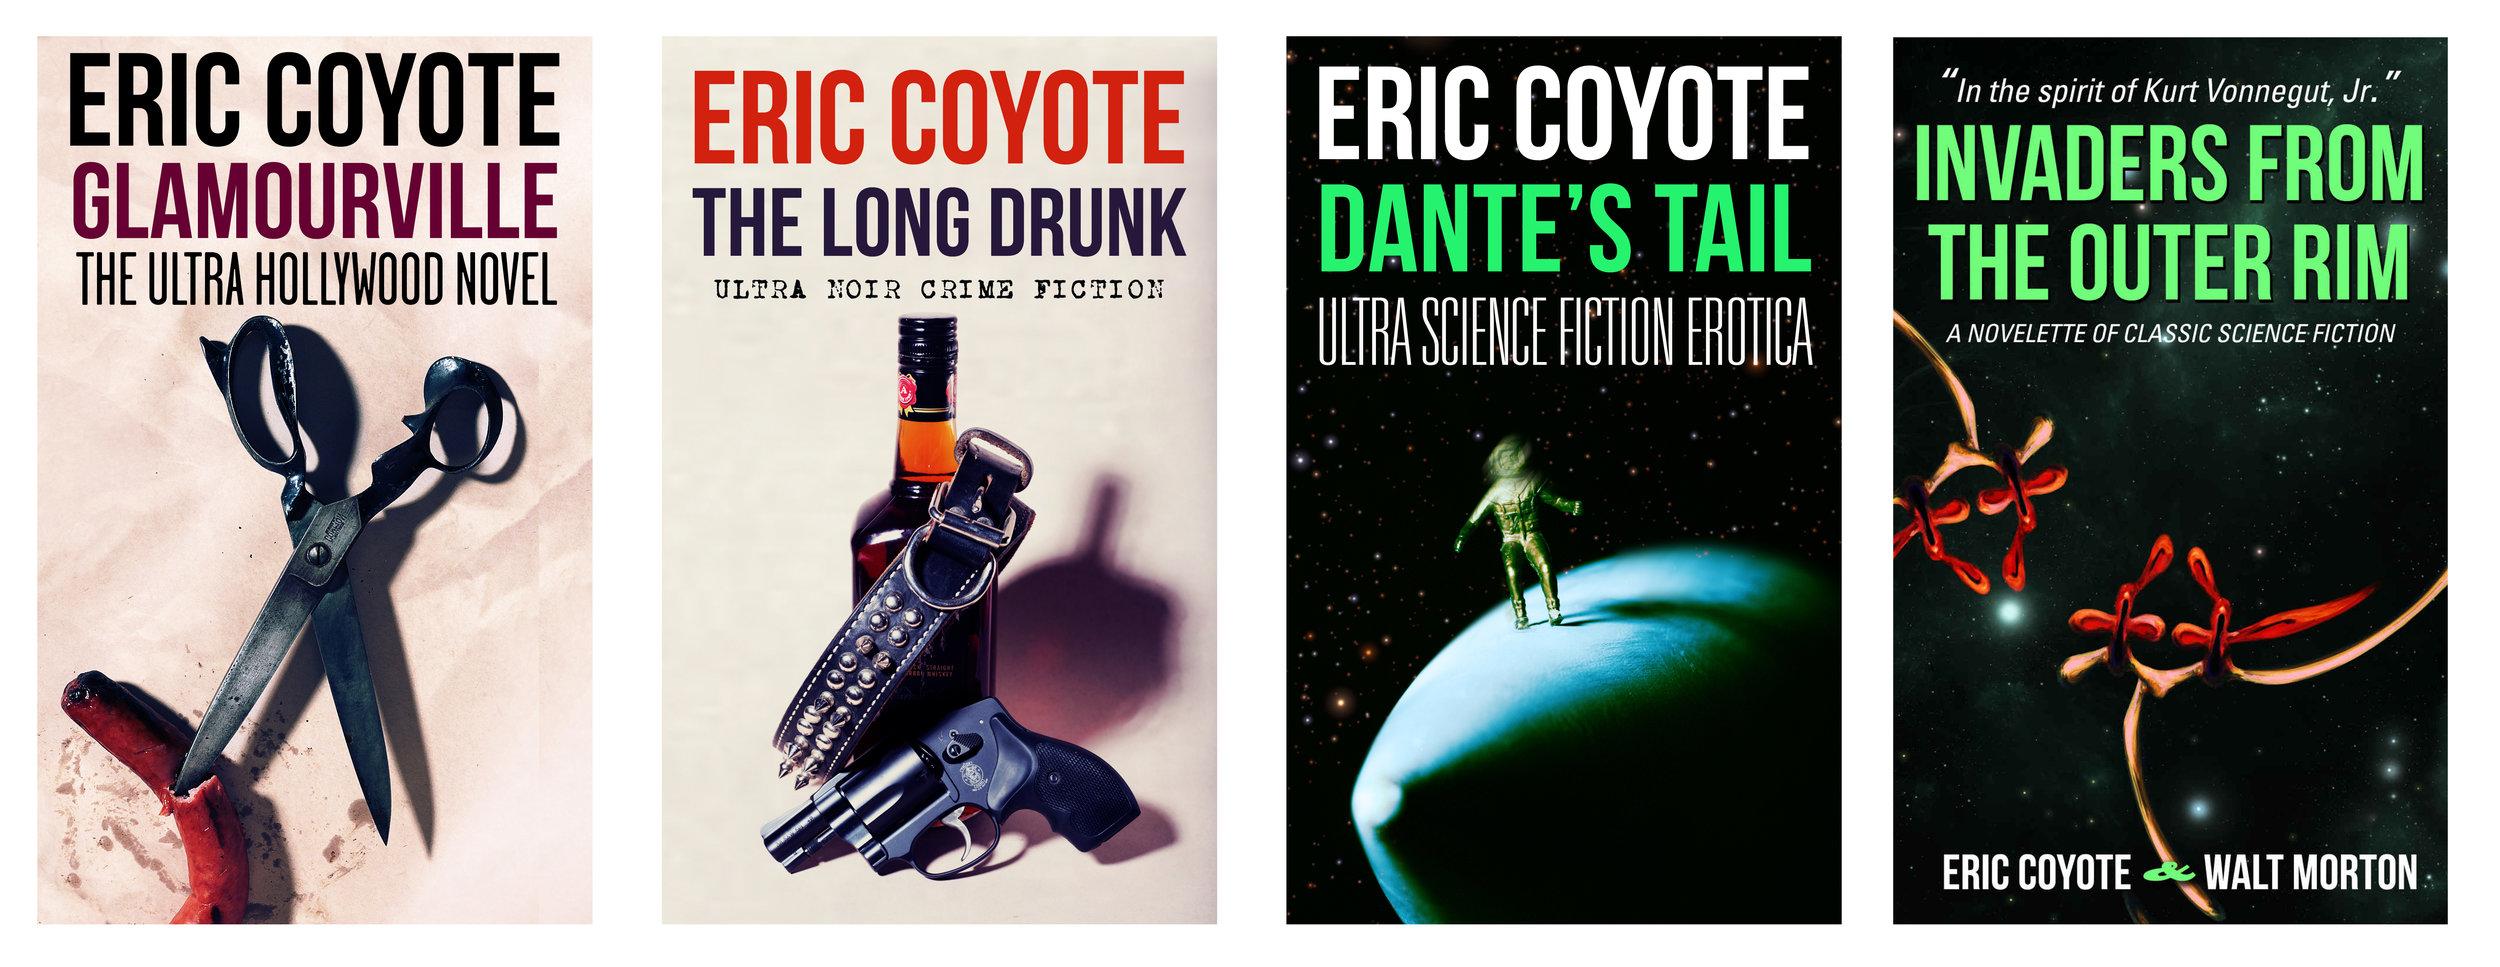 Eric Coyote Cover.jpg